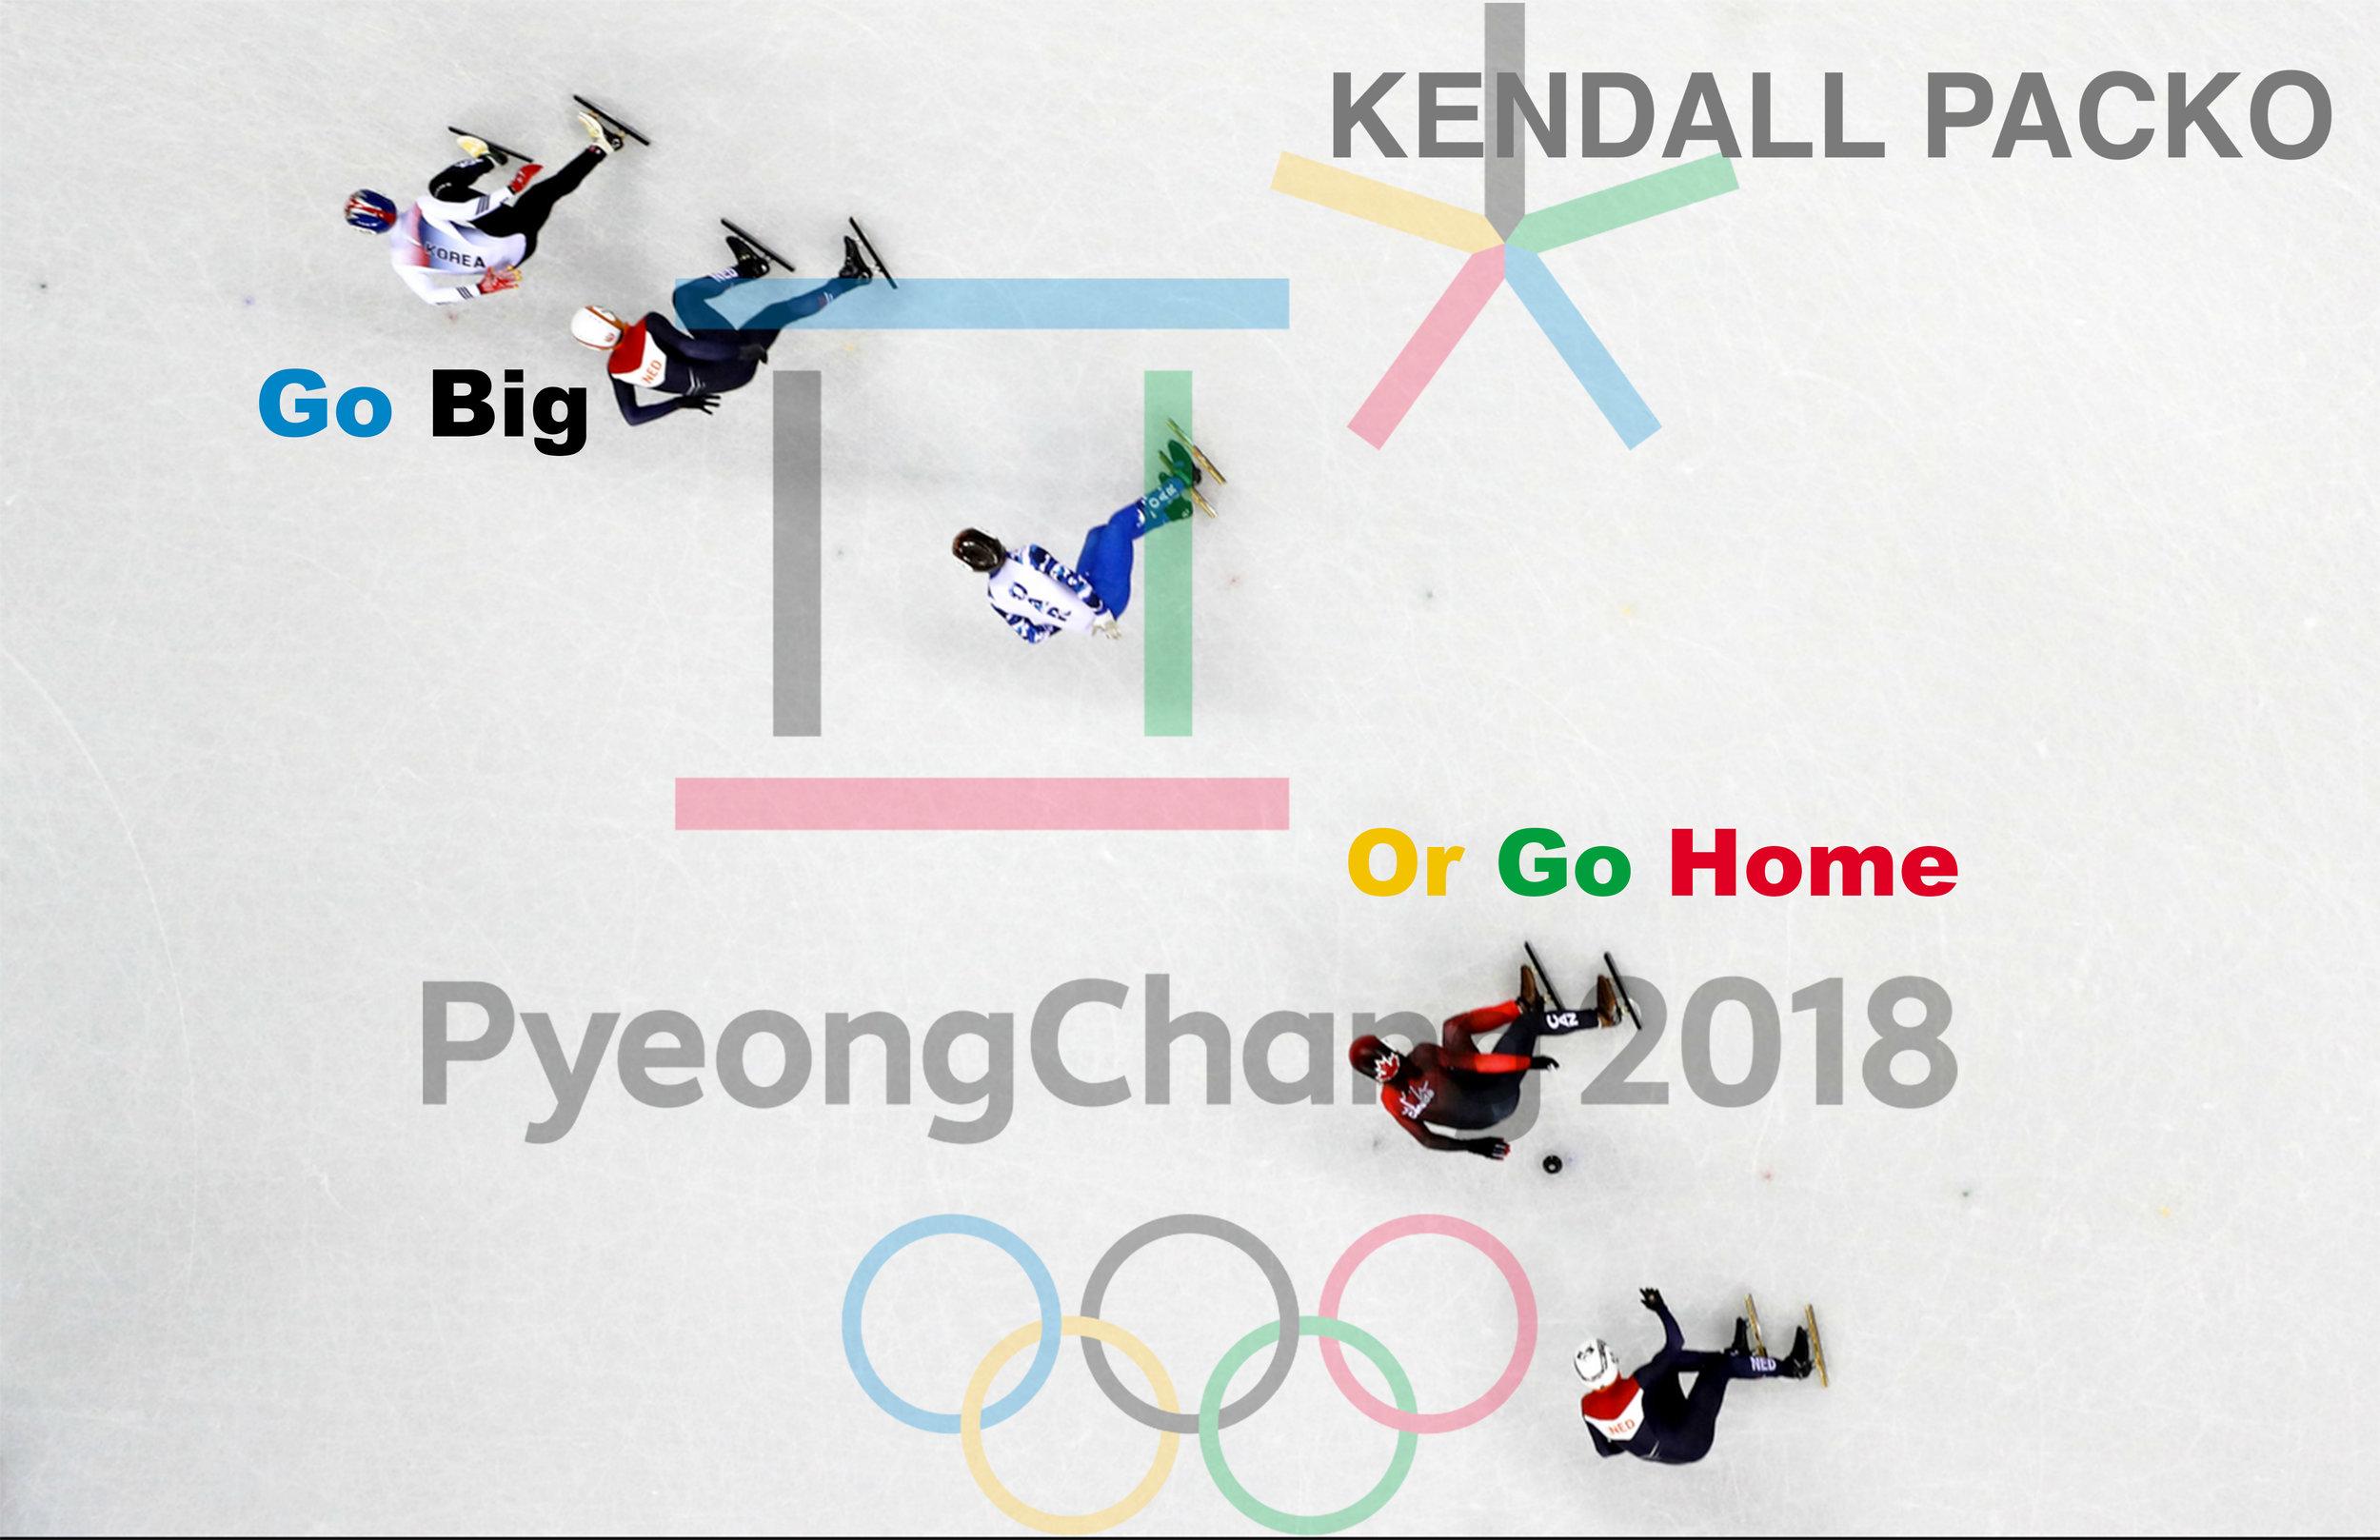 comm329 olympic billboard WATERMARK.jpeg